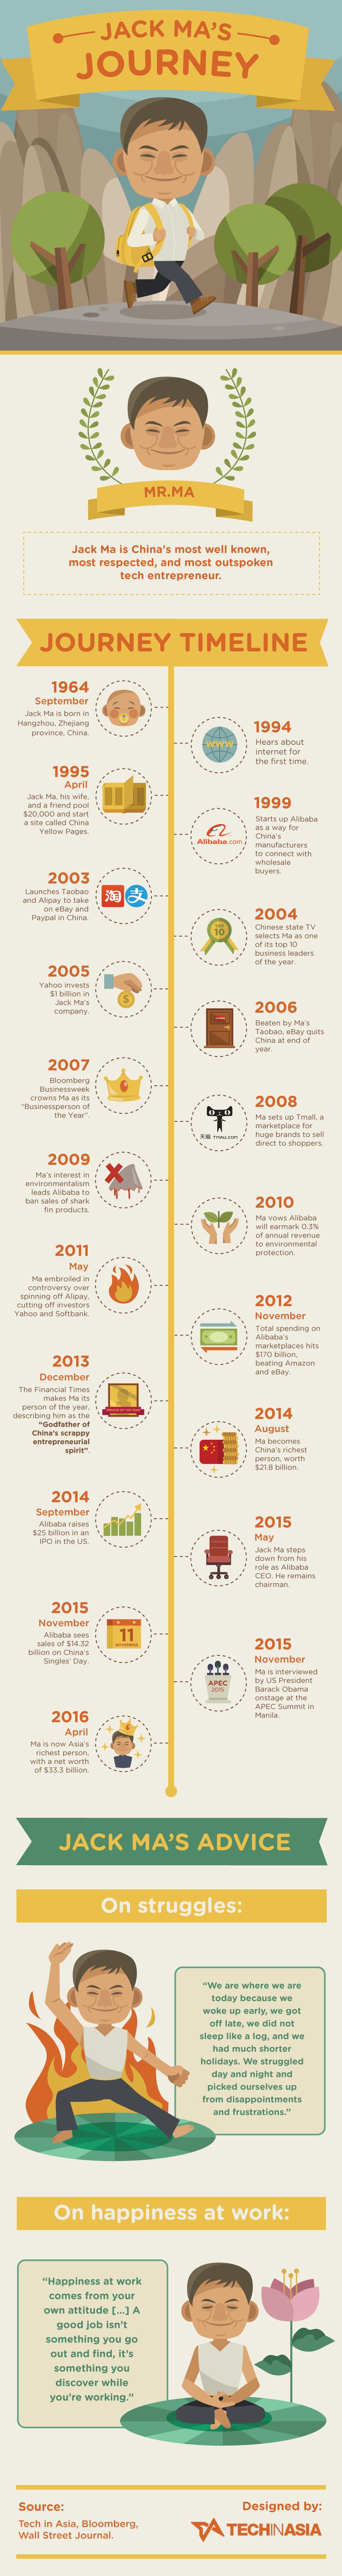 Jack Ma's journey - #Infographic